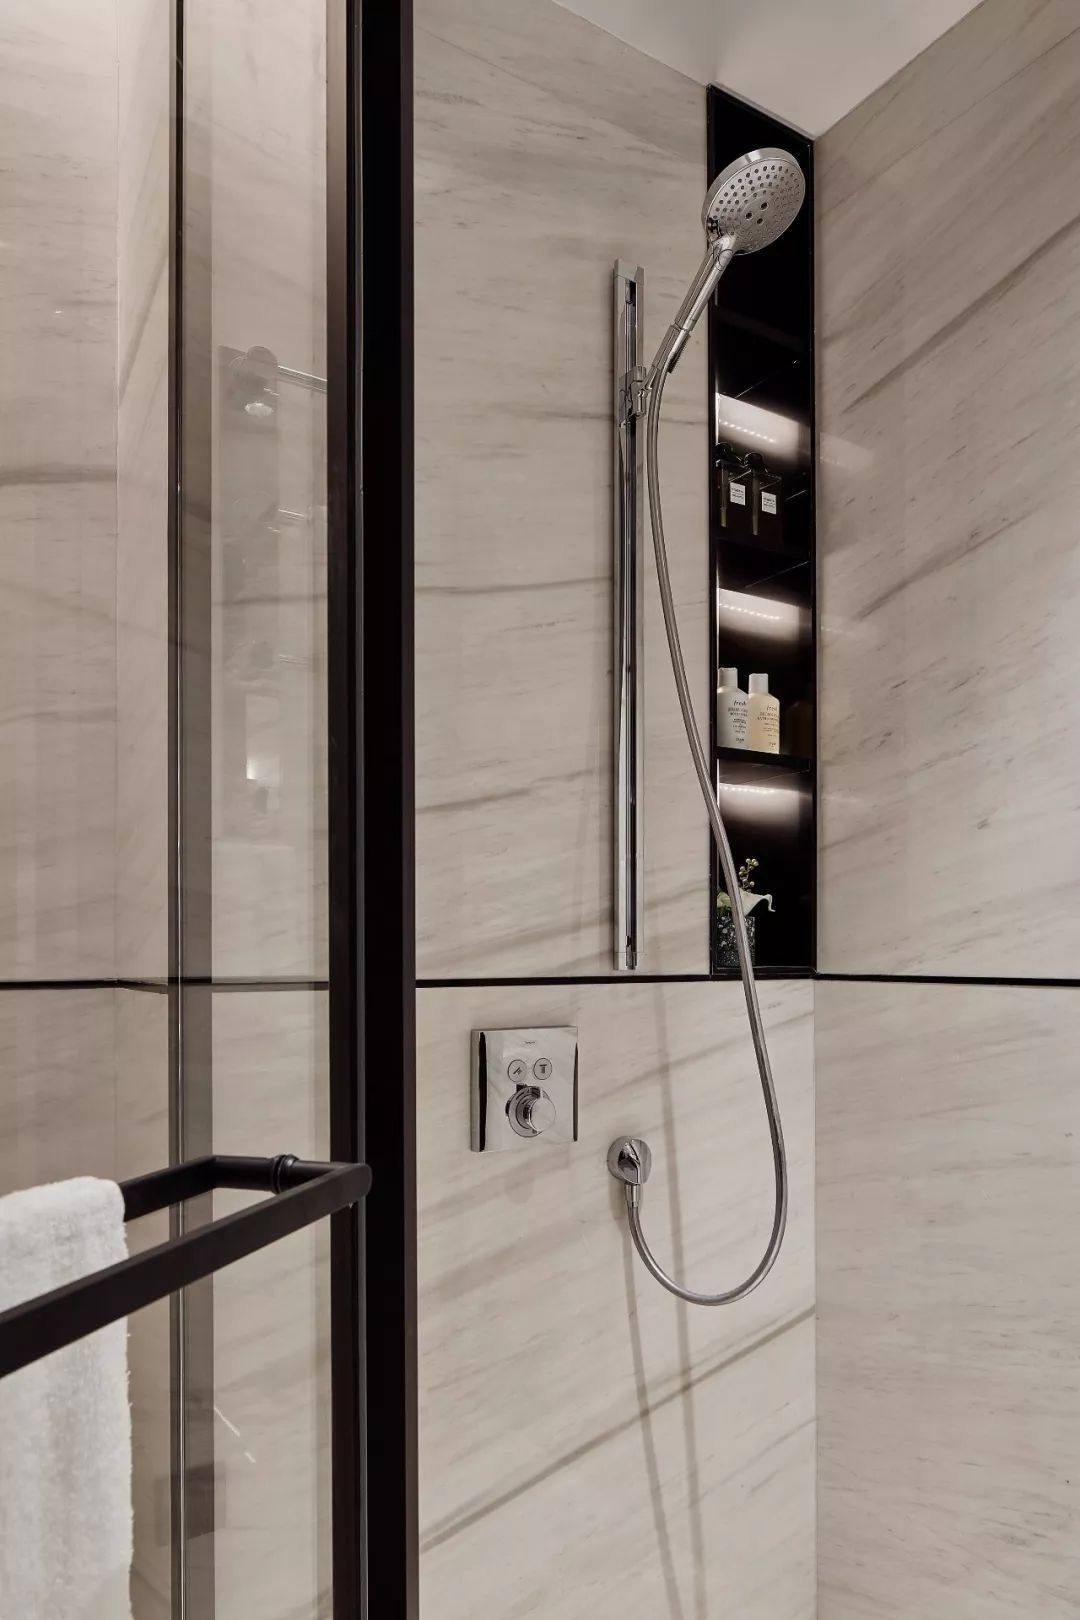 Pin By Chic Zinx On Bathroom Restroom Design Contemporary Bathroom Designs Public Restroom Design